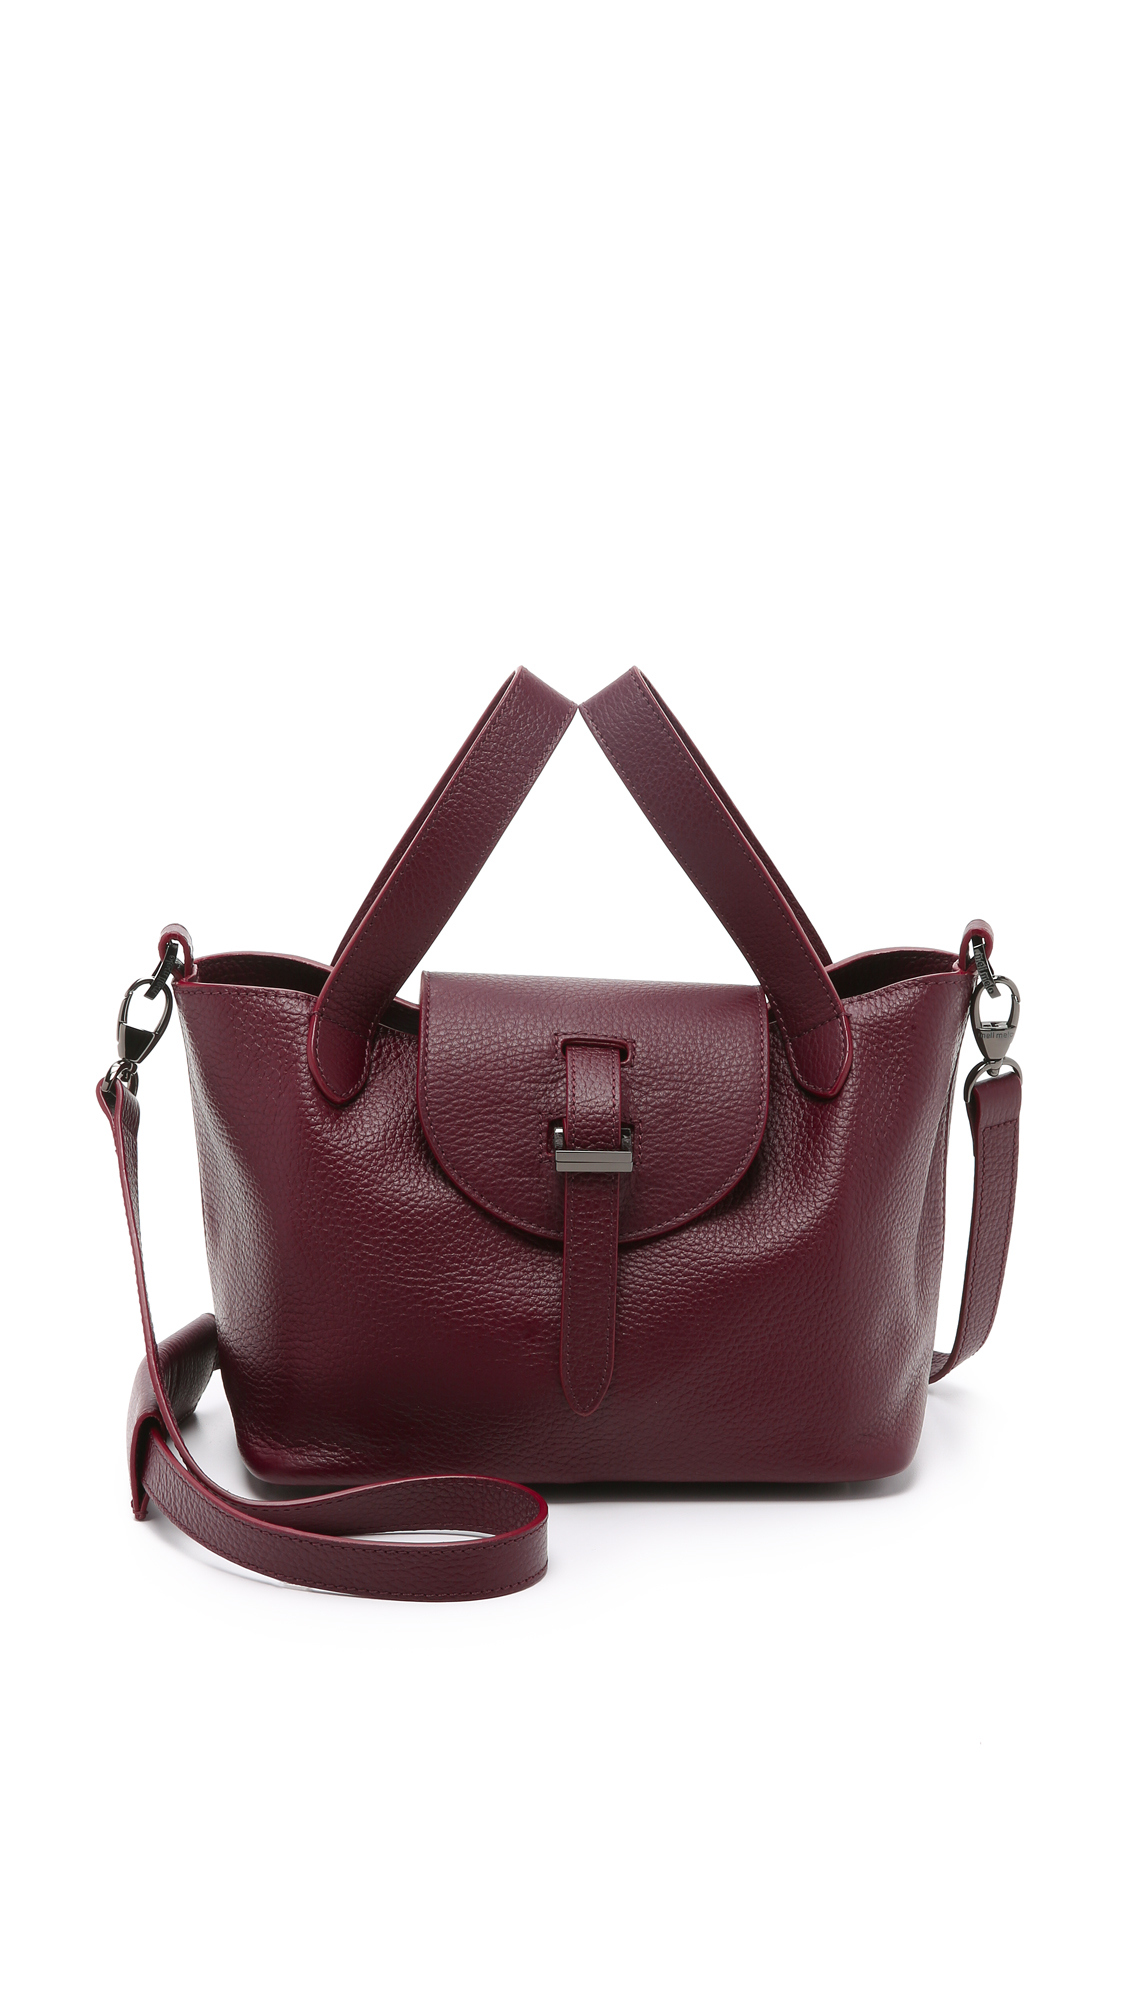 lyst meli melo thela mini bag burgundy in purple. Black Bedroom Furniture Sets. Home Design Ideas